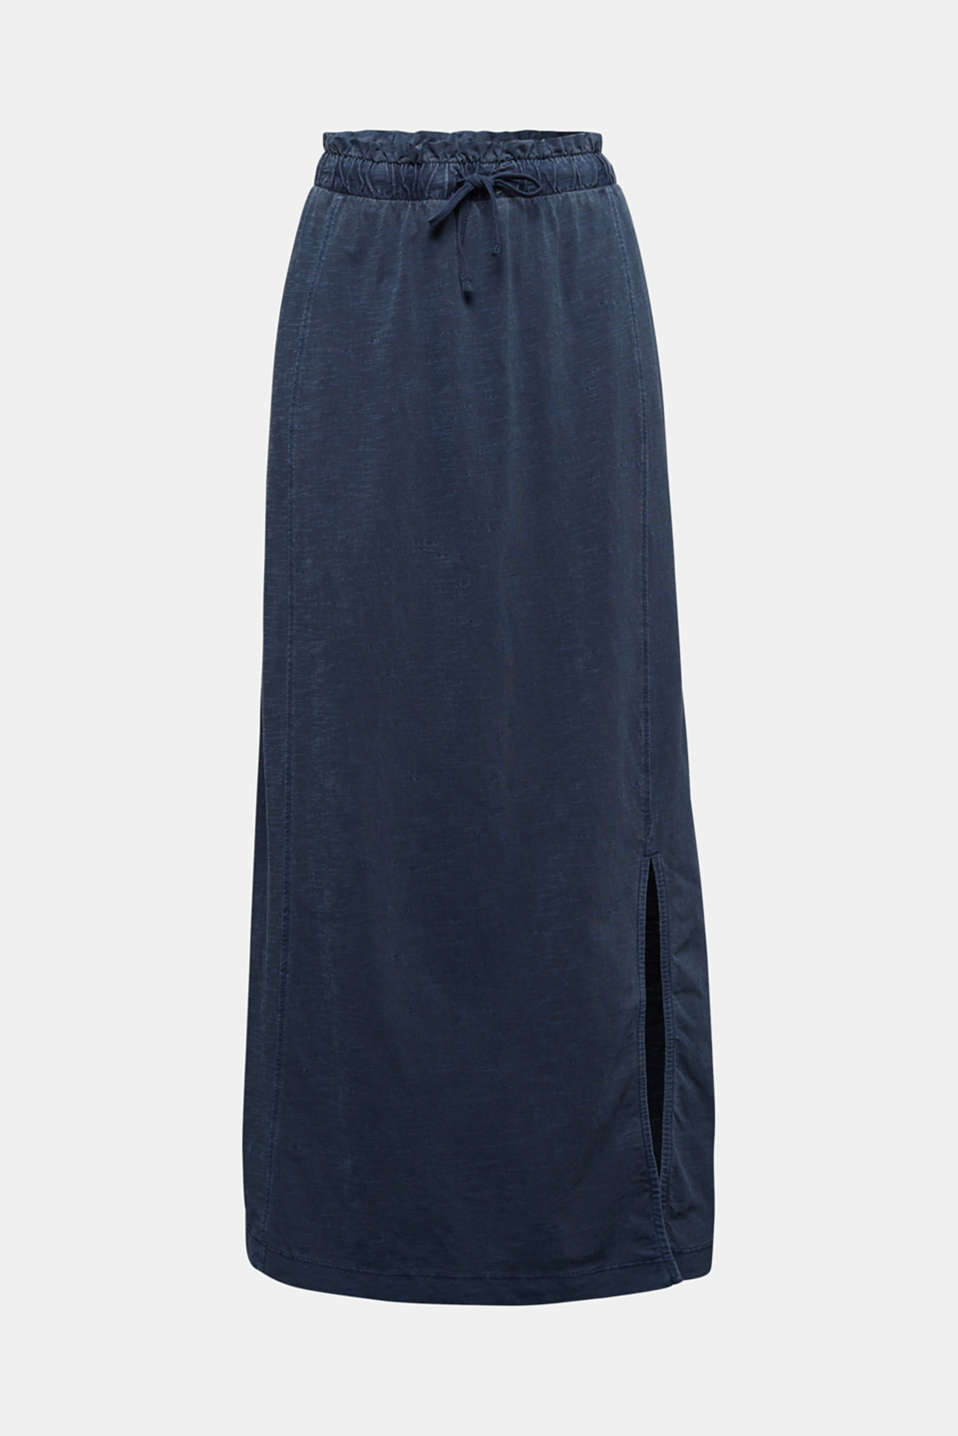 Jersey maxi skirt, 100% organic cotton, NAVY, detail image number 5